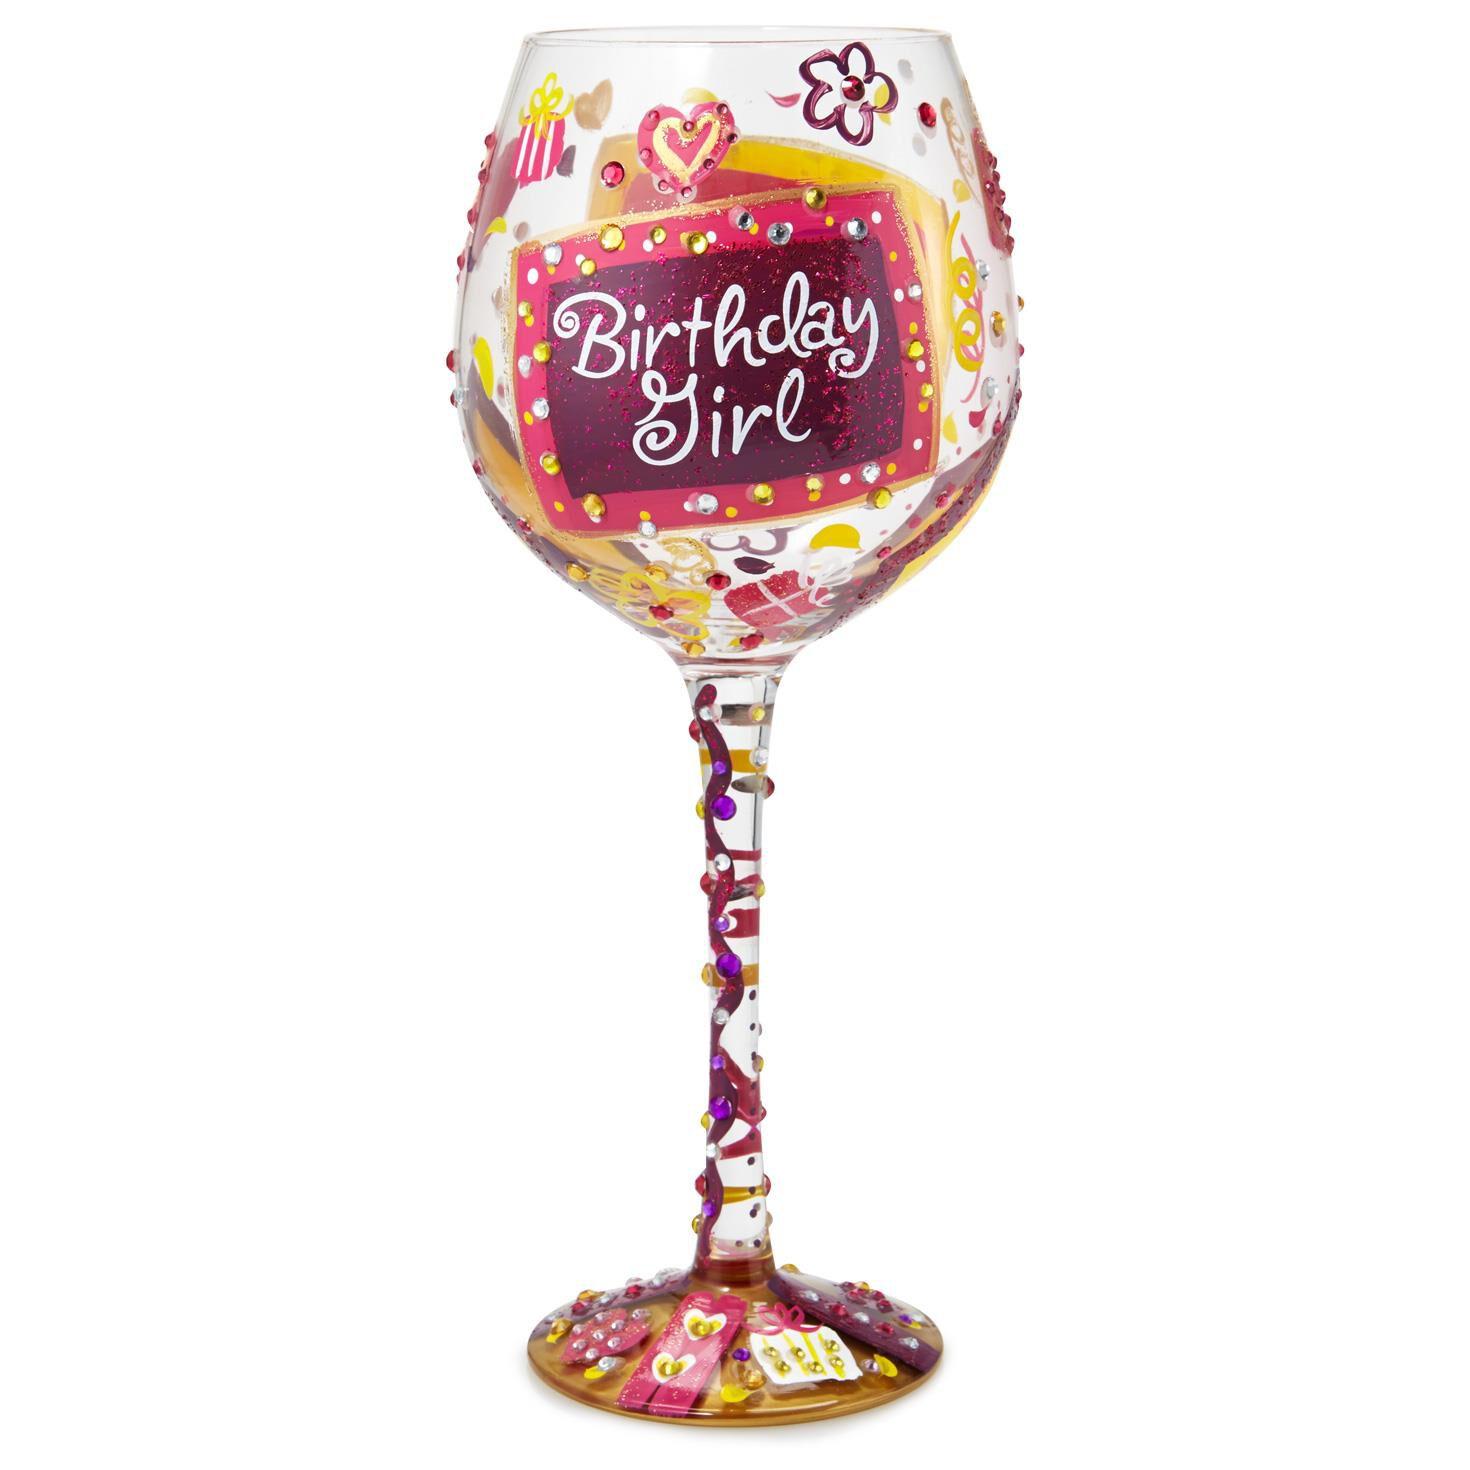 LolitaR Birthday Girl Oversized Hand Painted Wine Glass 22 Oz